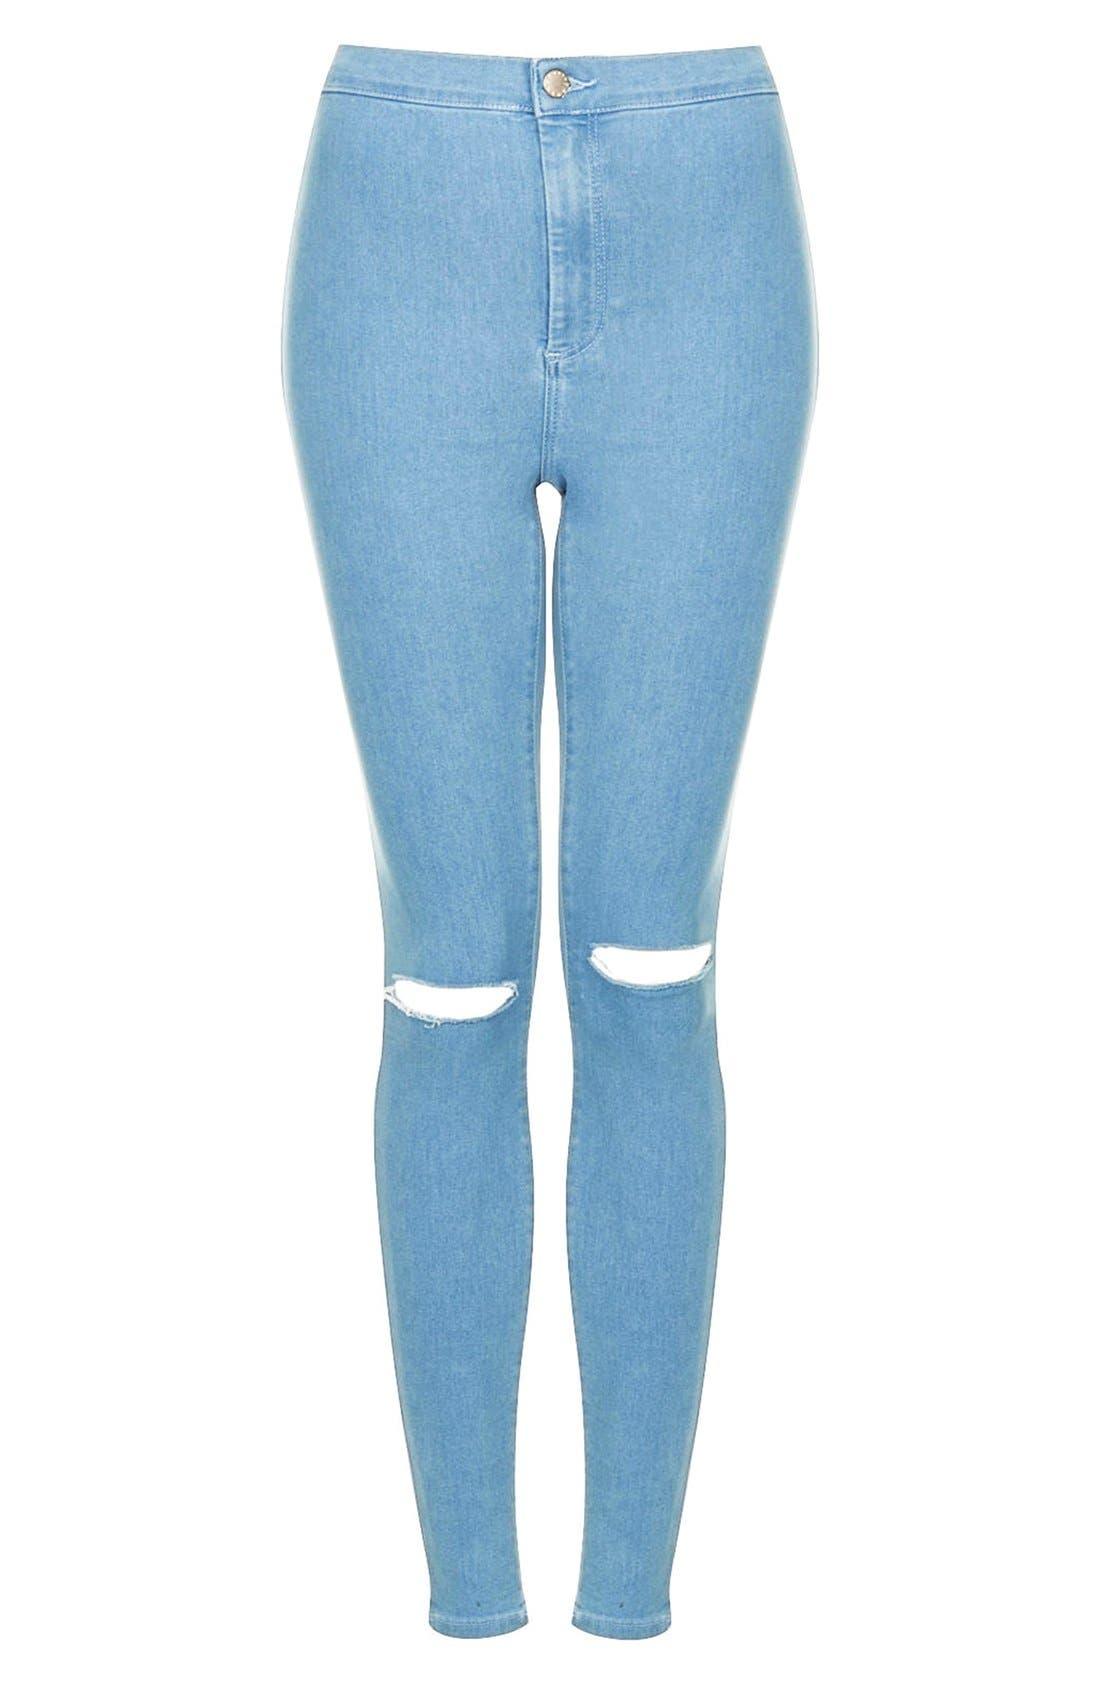 Alternate Image 3  - Topshop Moto 'Joni' Ripped High Rise Skinny Jeans (Light Denim) (Short)